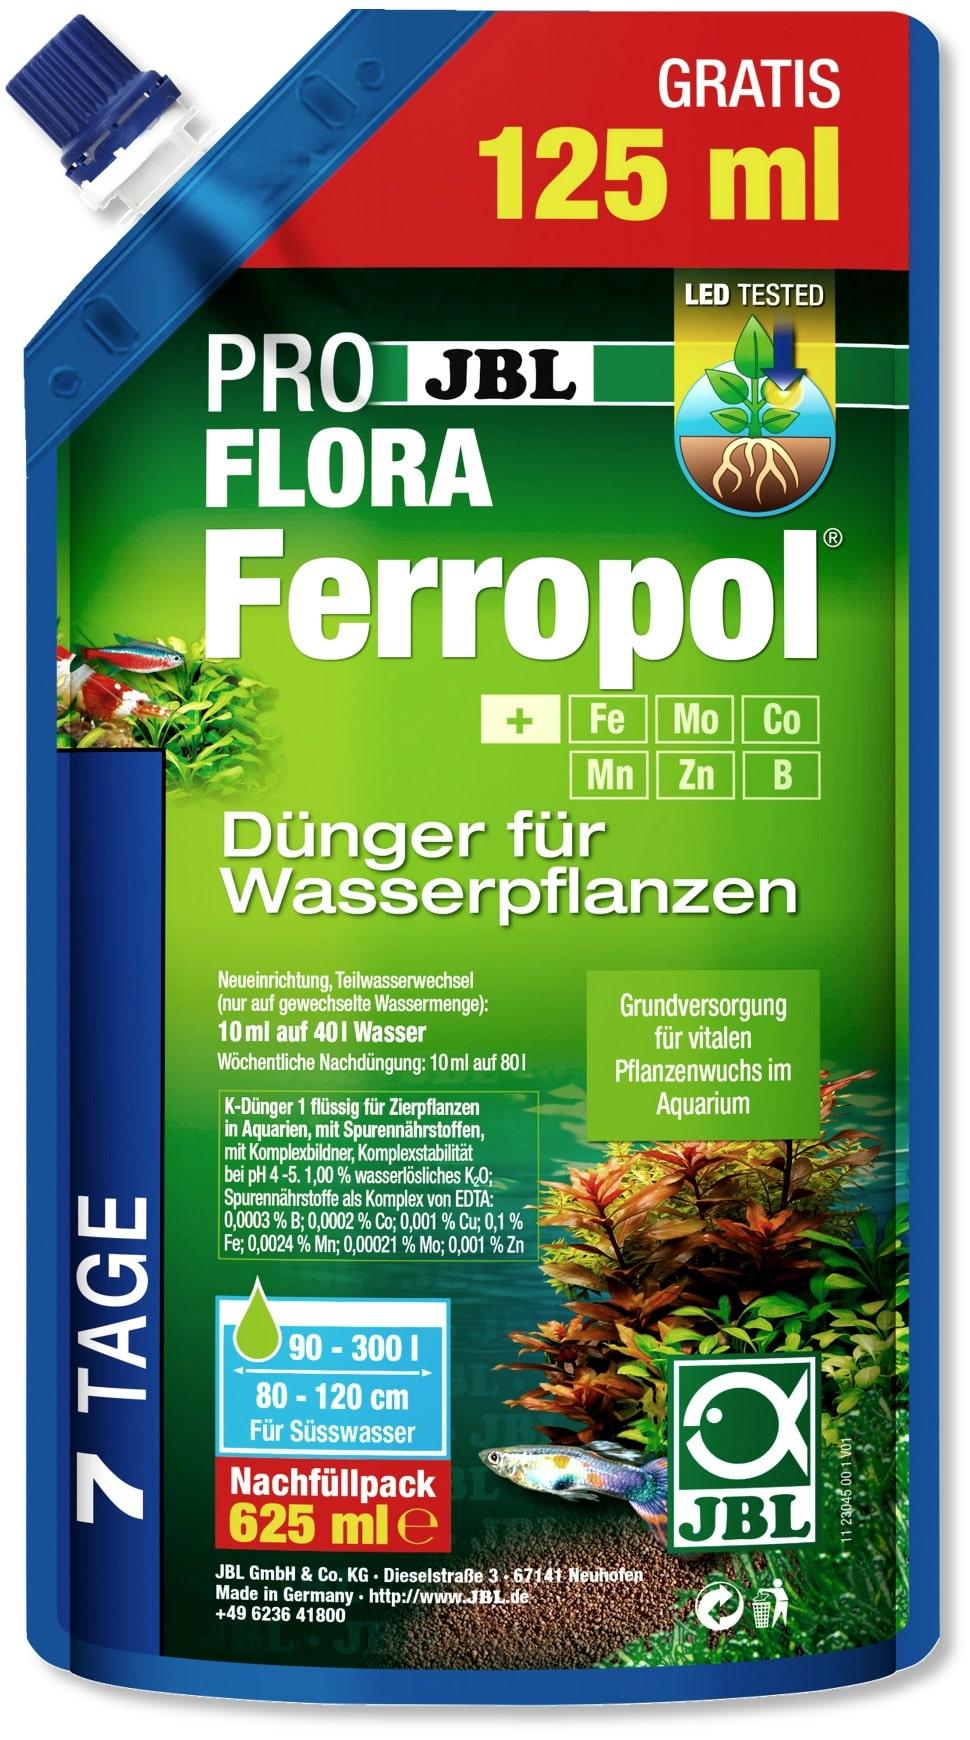 jbl-ferropol-recharge-500ml-125ml-gratuit-engrais-liquide-complet-contenant-des-oligo-elements-min